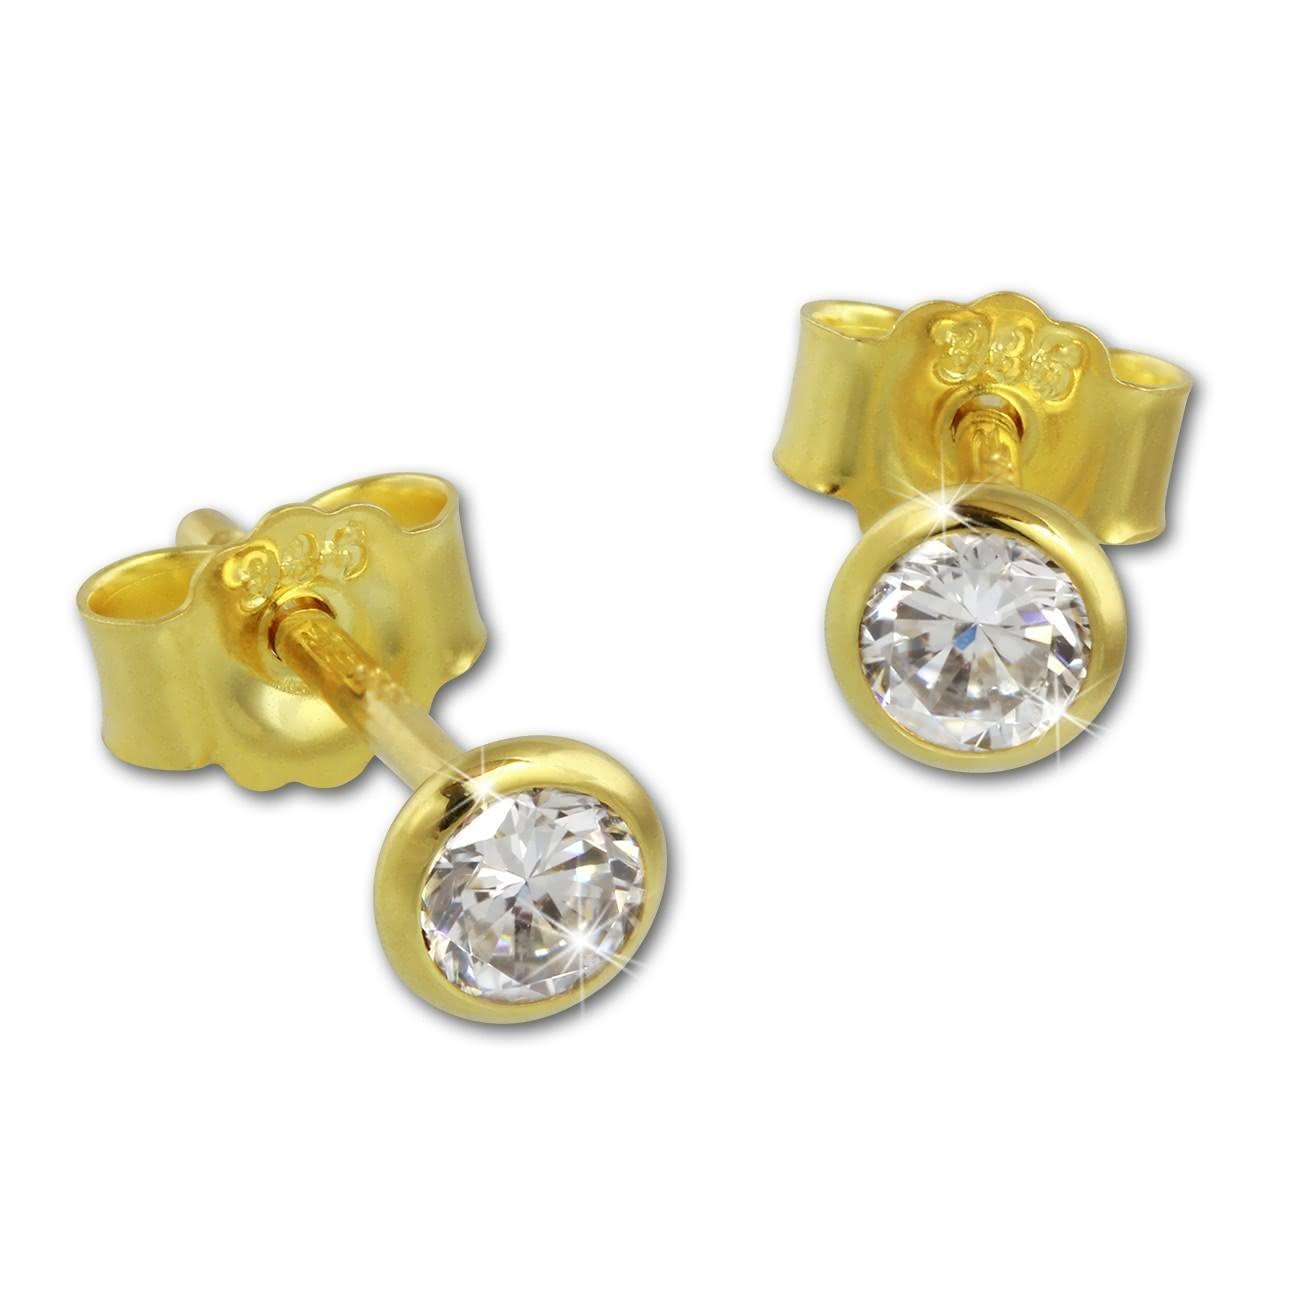 SilberDream Ohrstecker Zirkonia 4mm weiß Ohrring 333 Gelbgold GDO0054Y